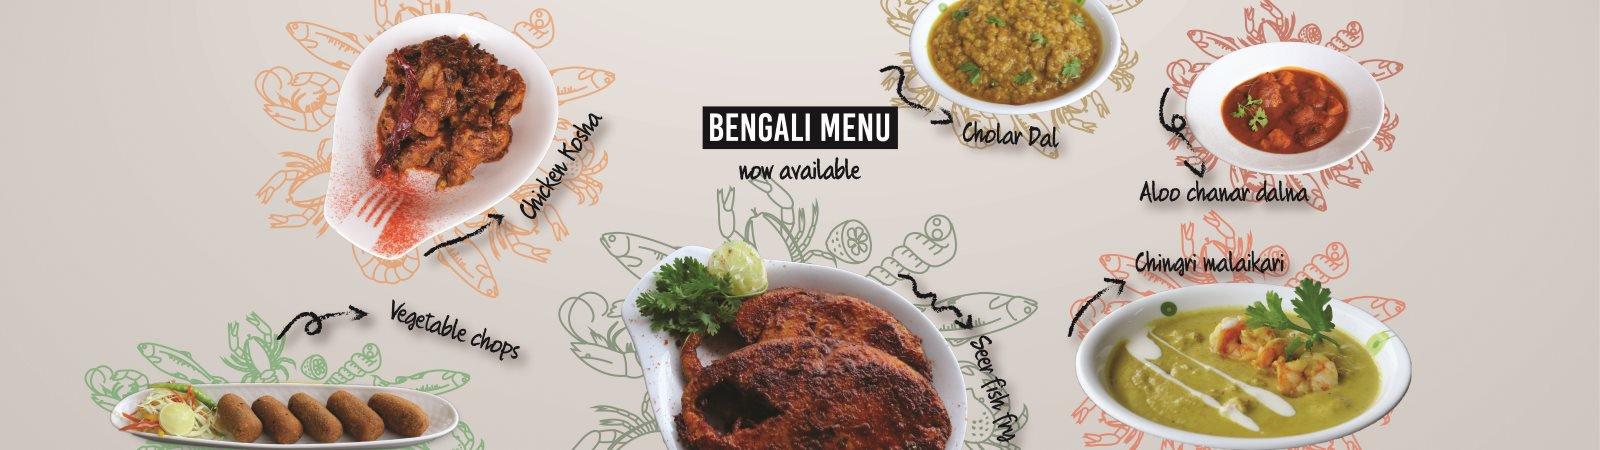 Bengali menu now available